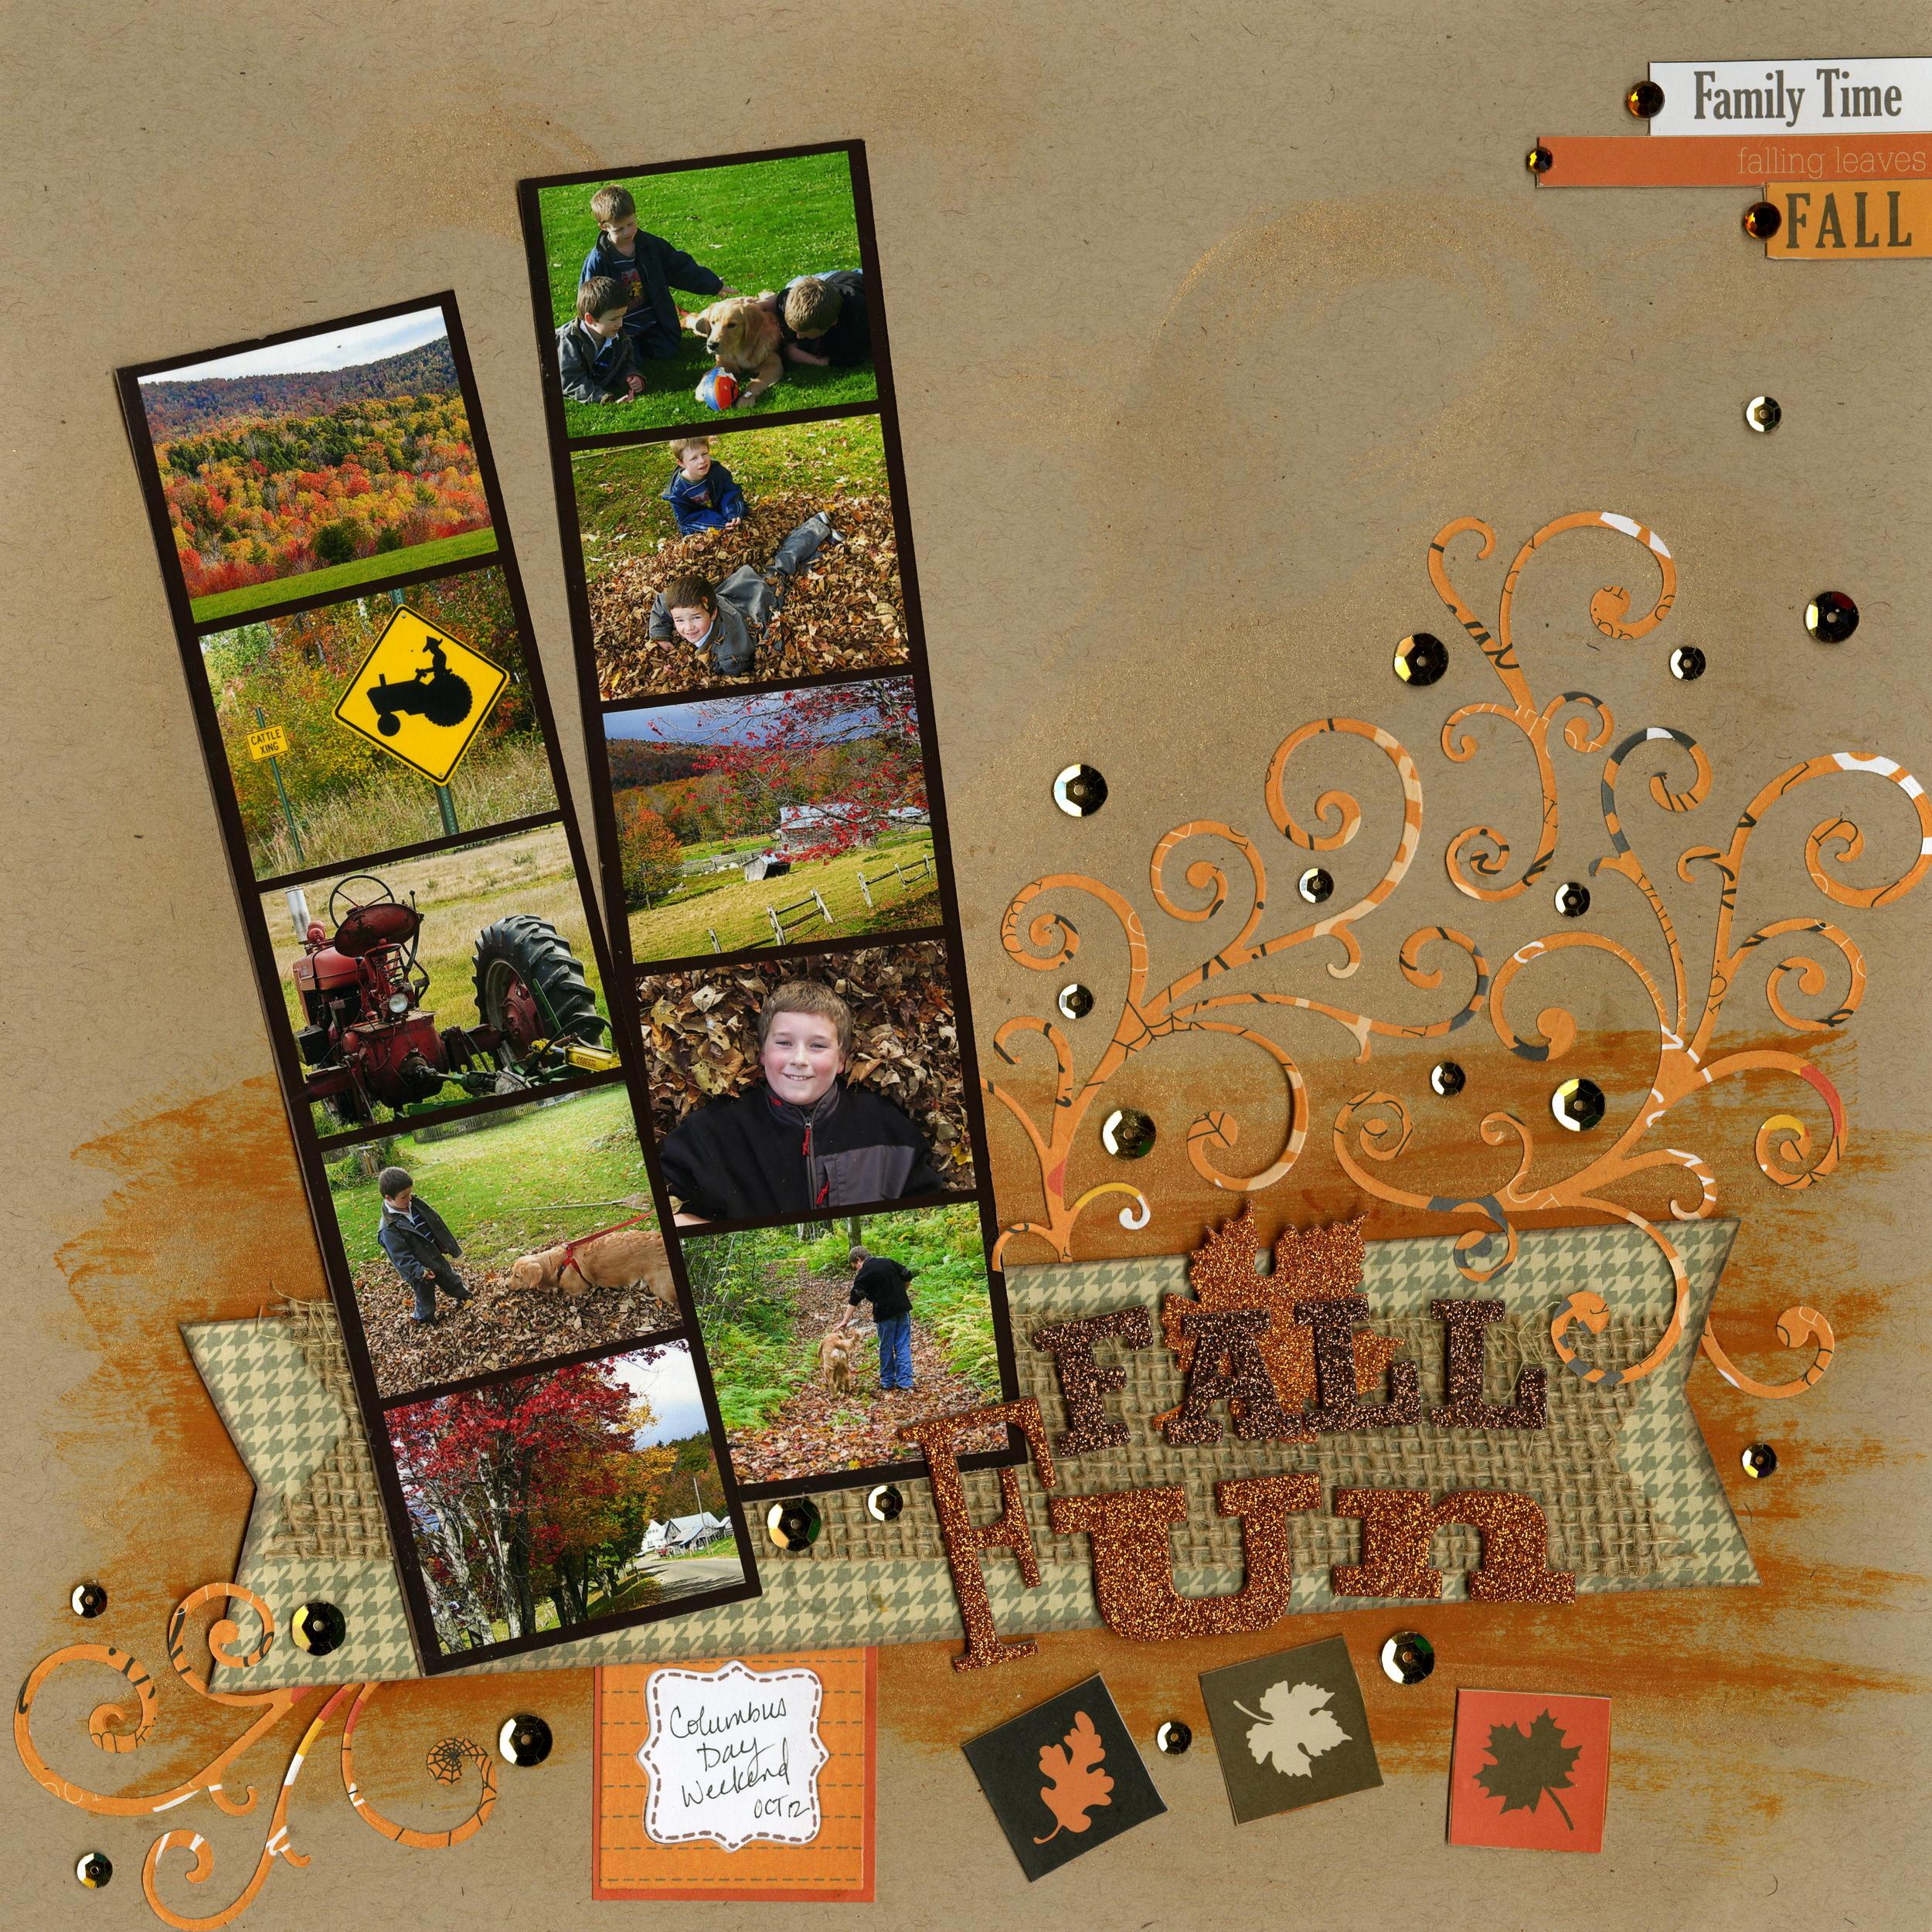 Fall Page with mambi KIT scrapbook layout.